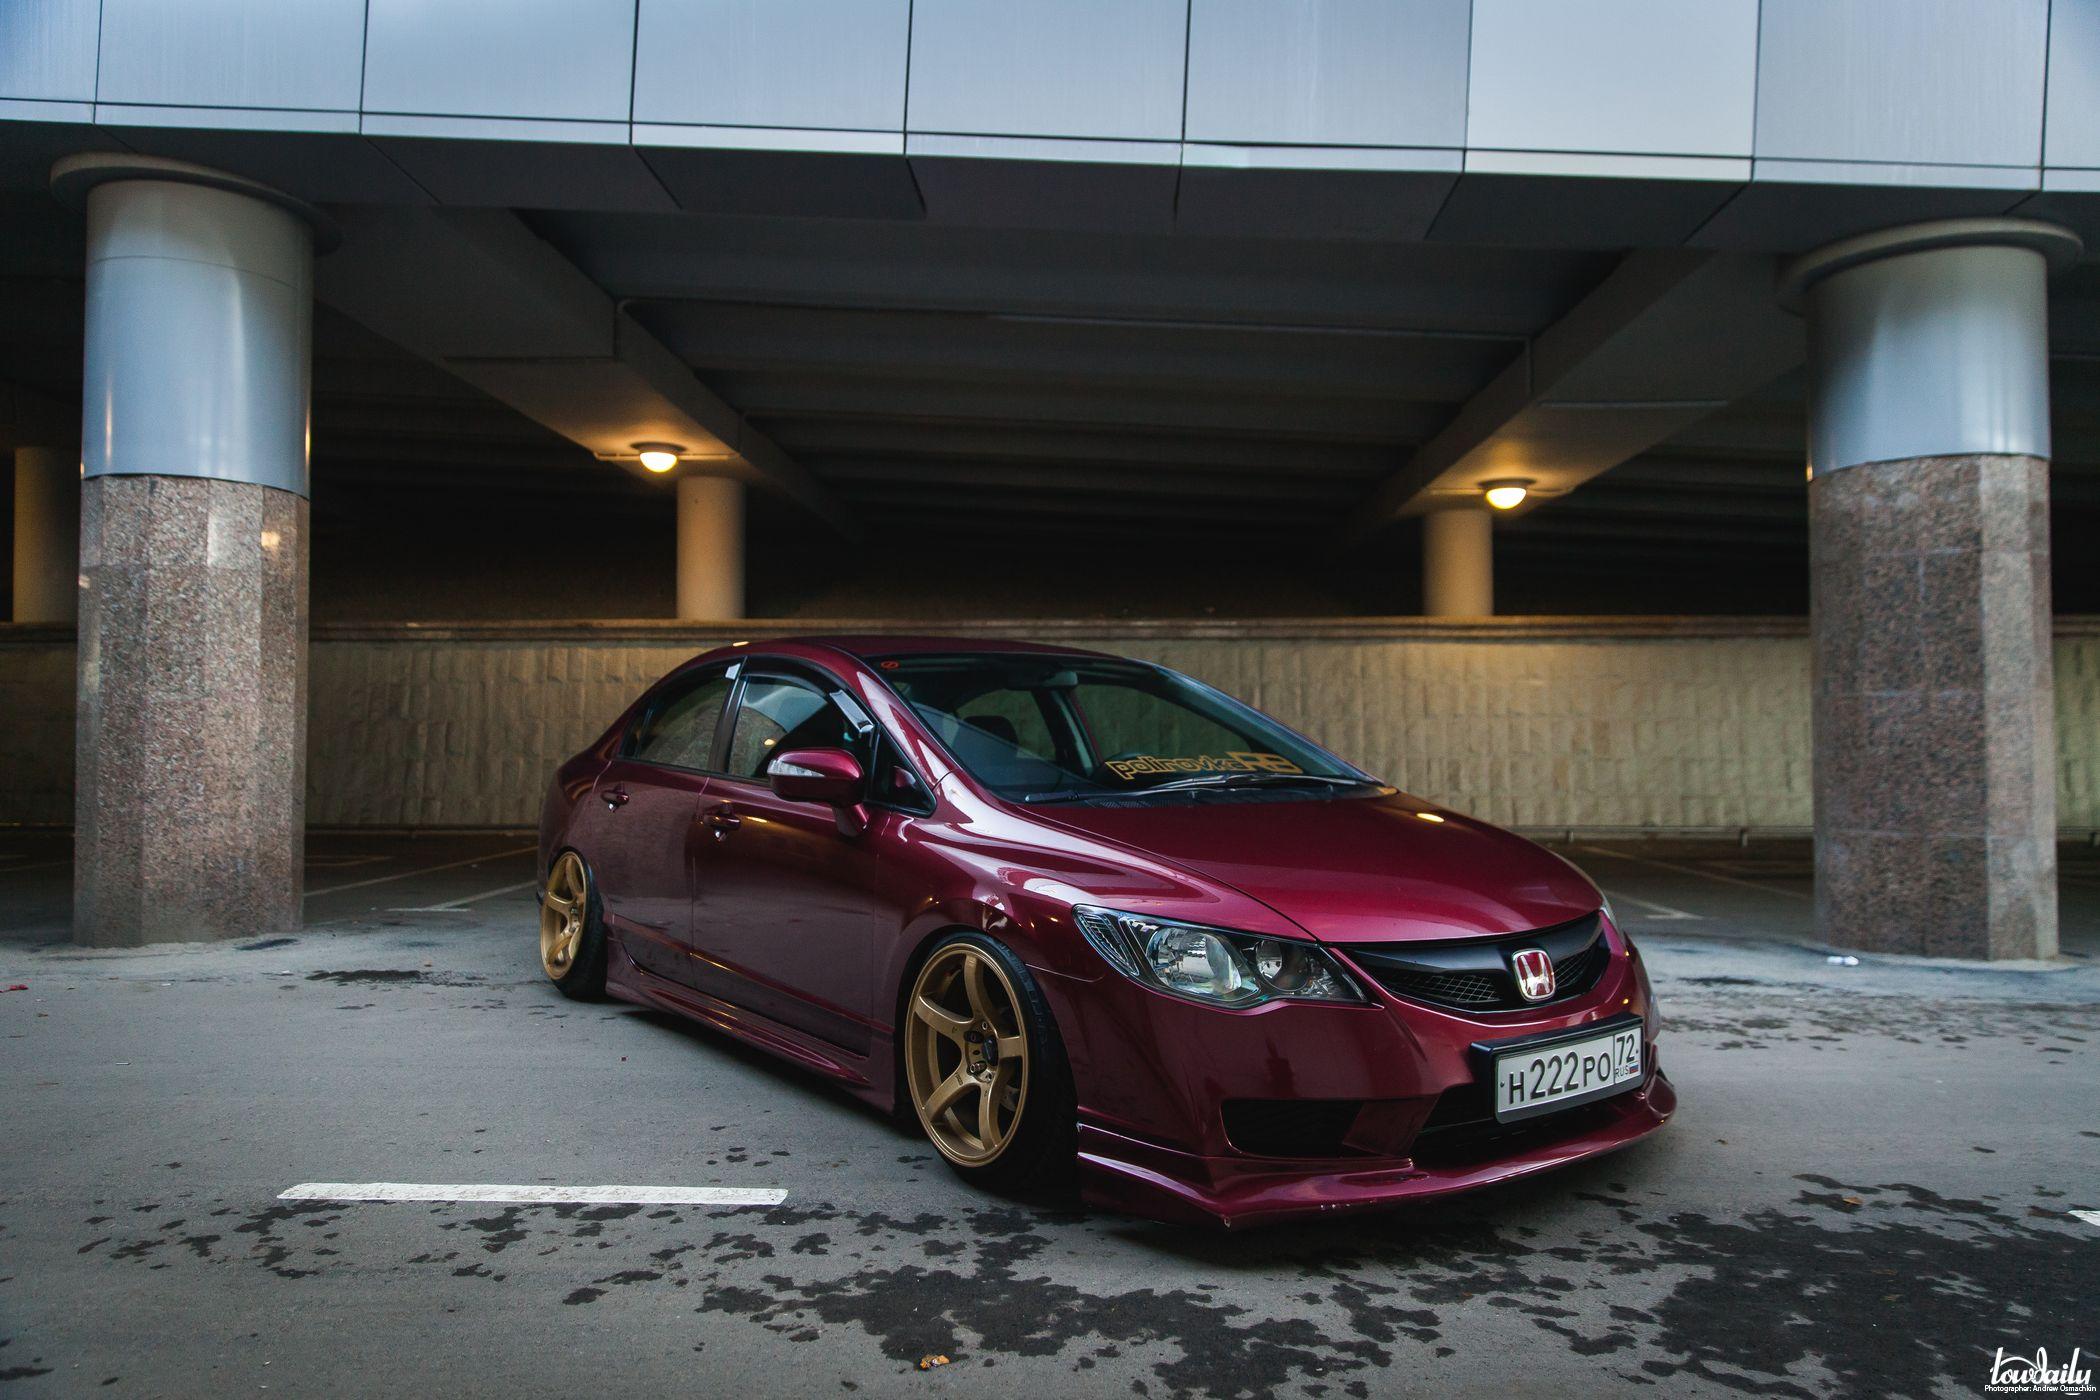 _Mg_5417_Honda_Civic